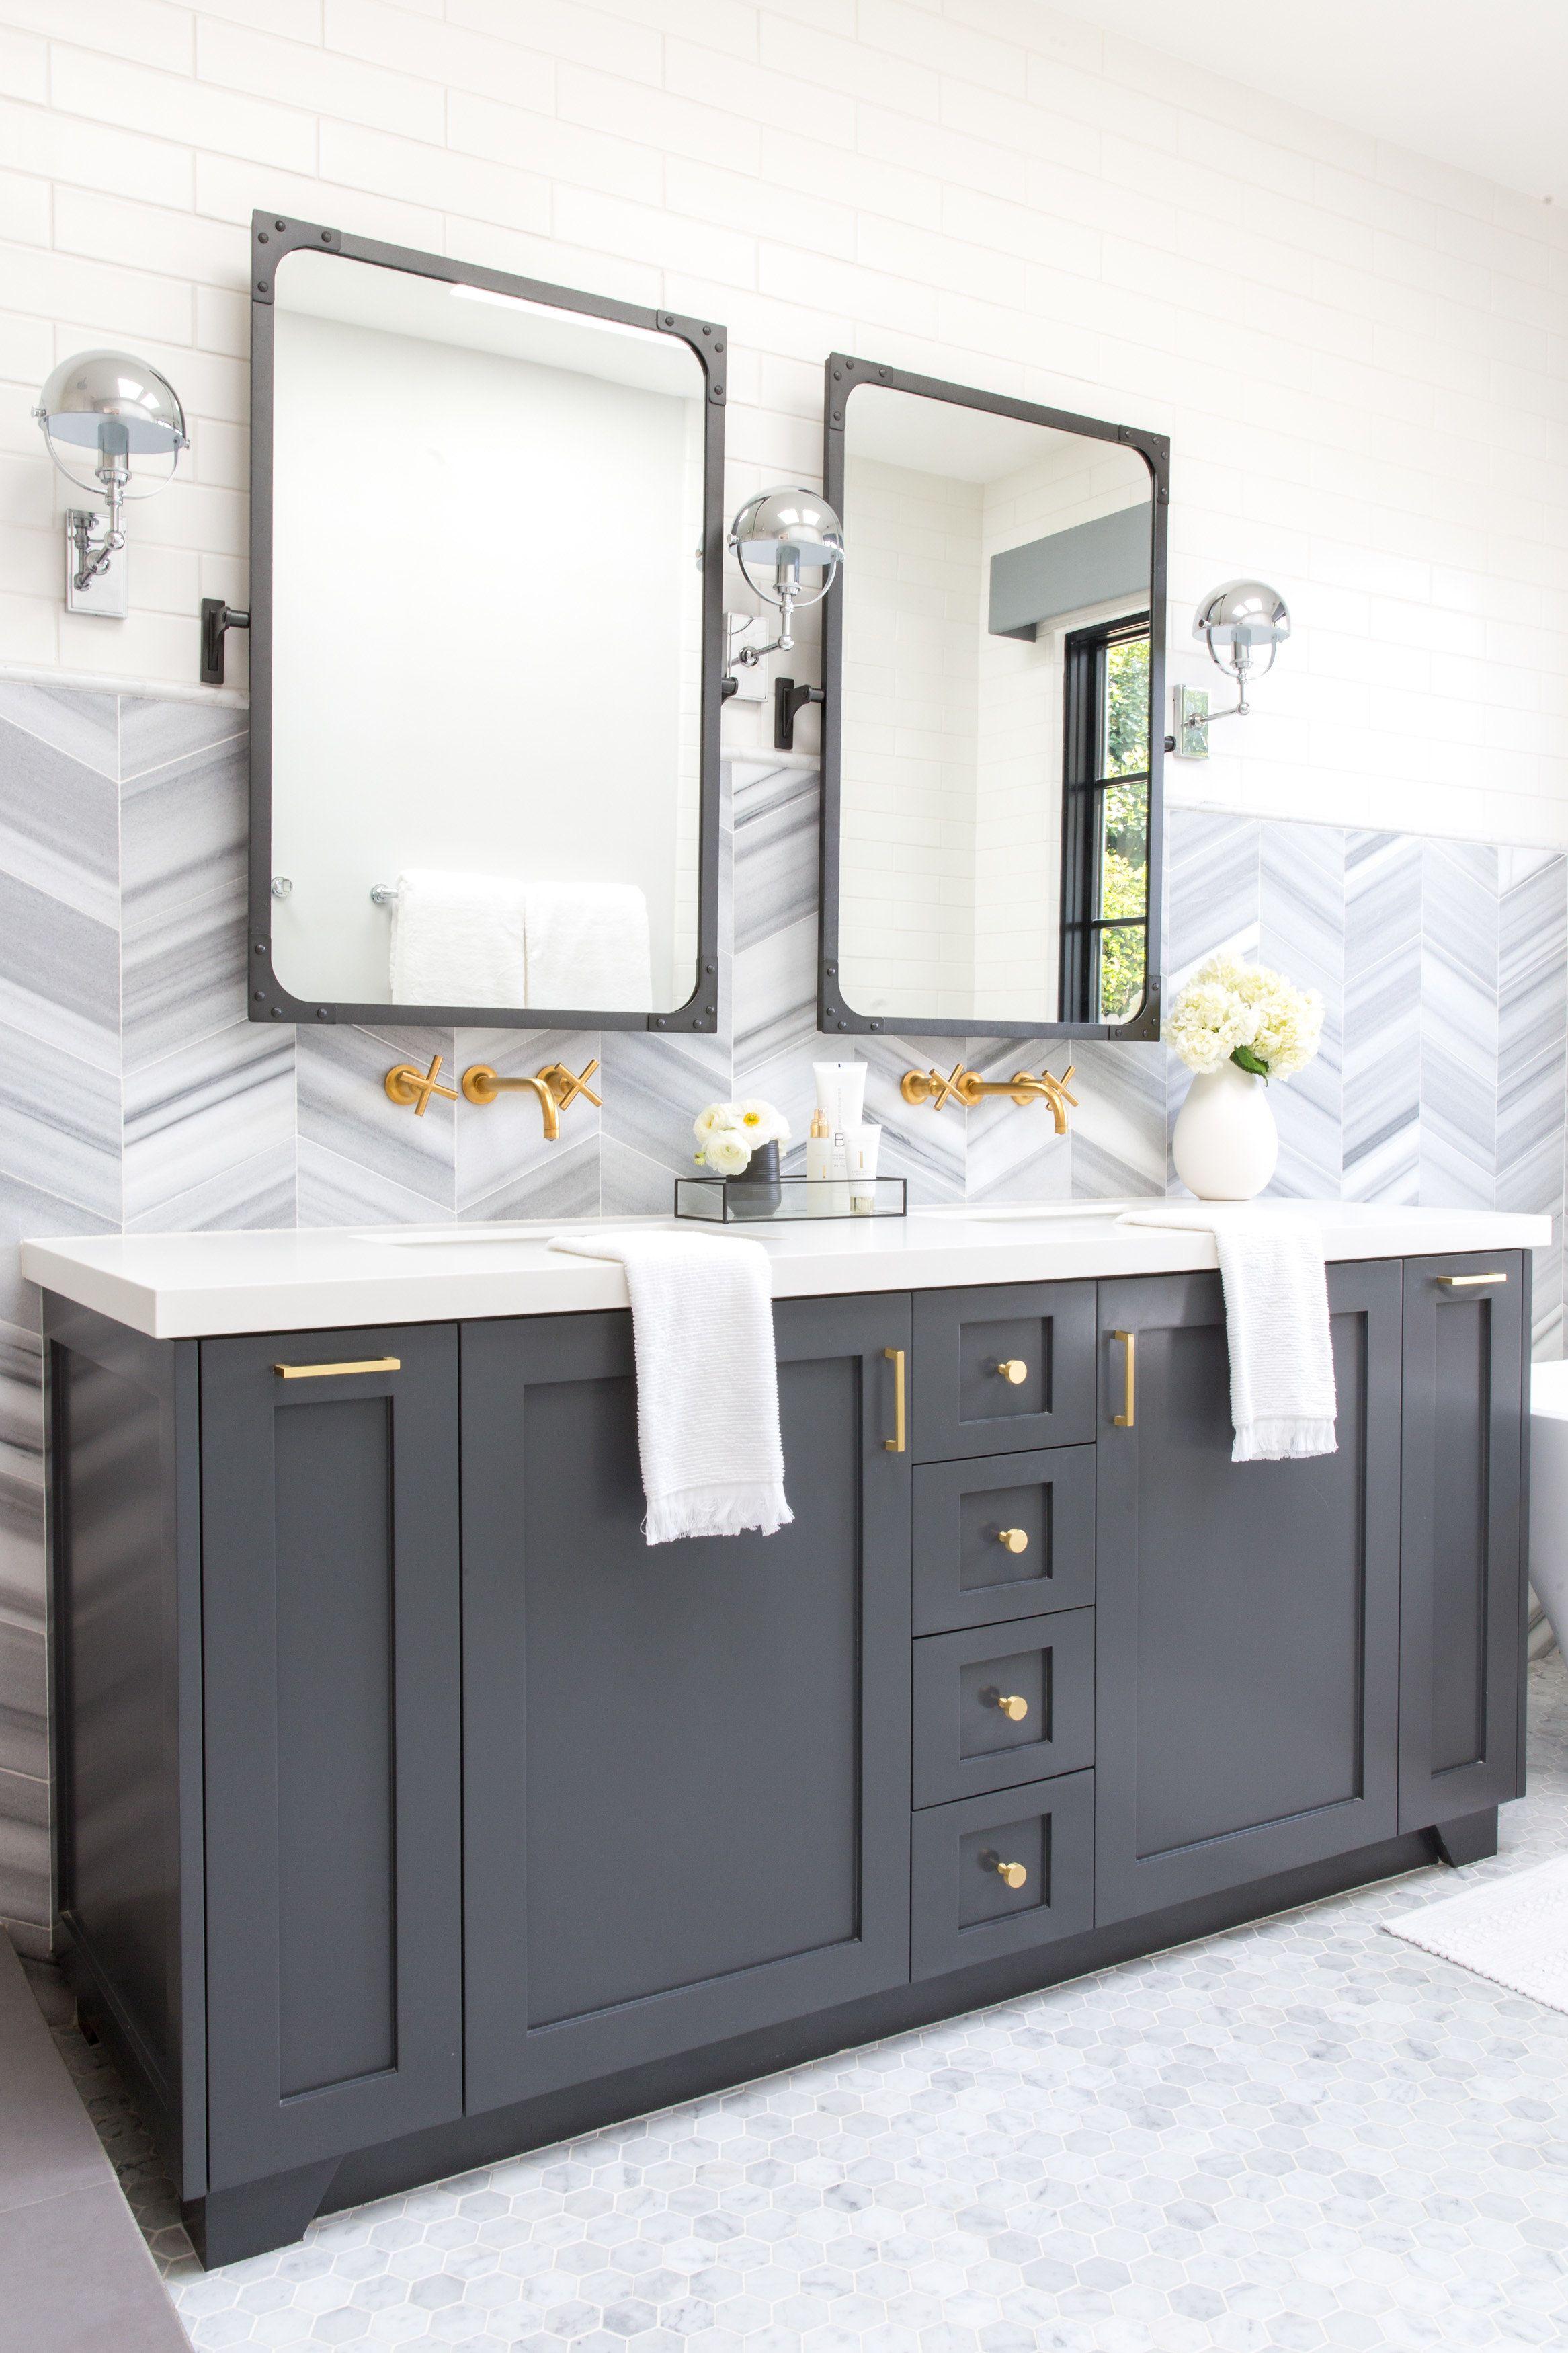 34+ Dark gray bathroom vanity ideas ideas